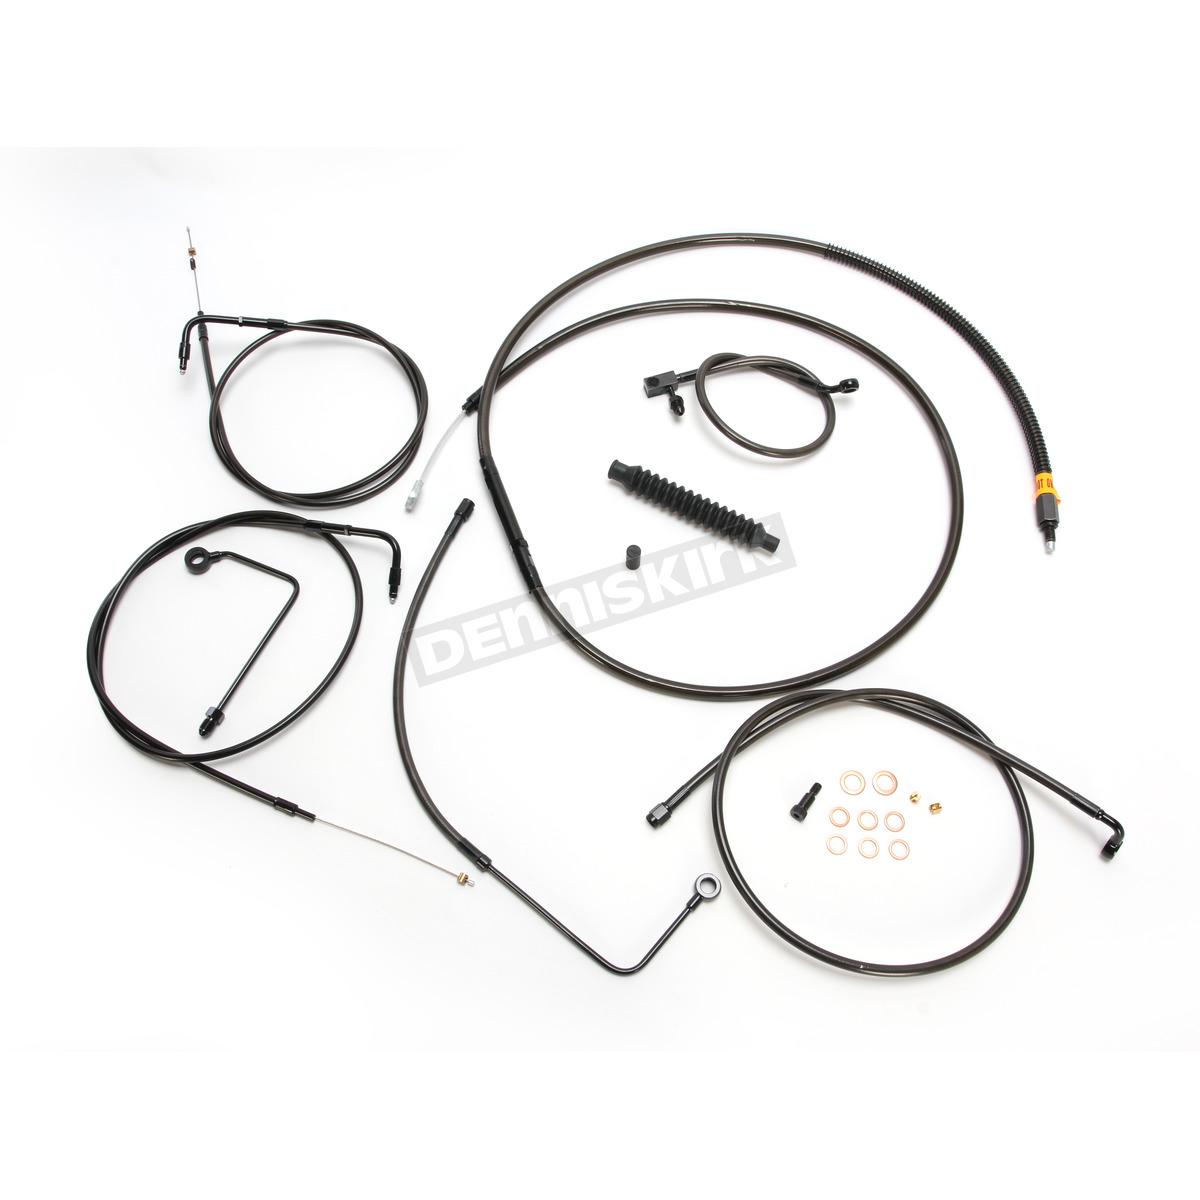 La Choppers Midnight Series Standard Handlebar Cable Brake Line Kit W Abs For 15 17 Ape Hanger